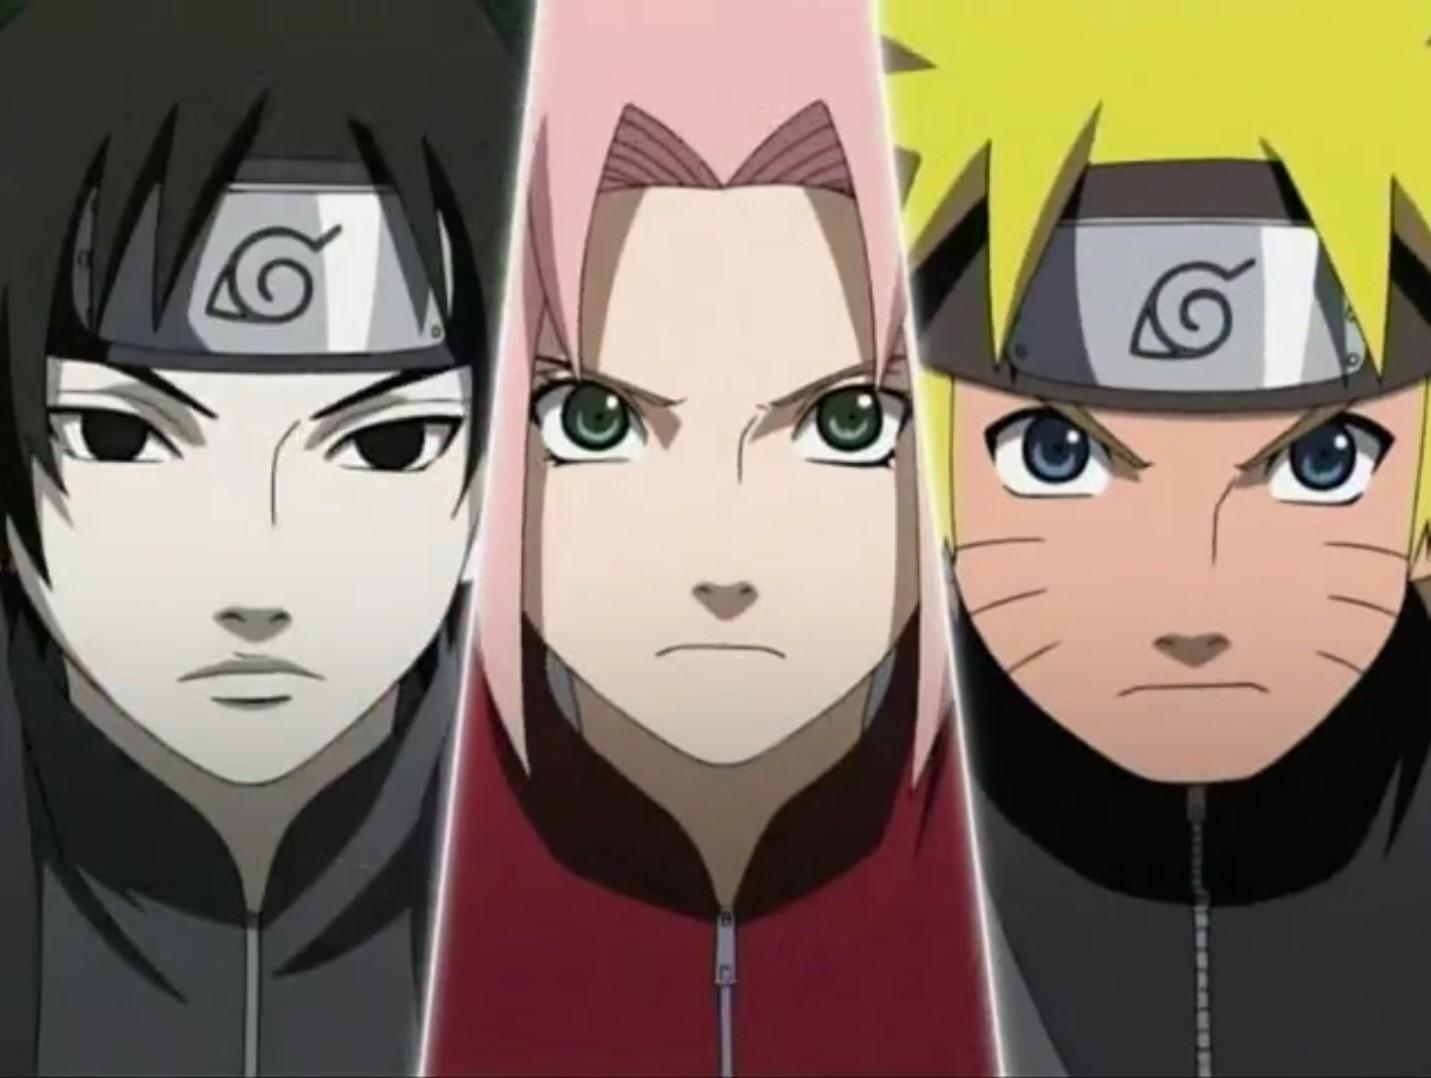 Naruto Shippuden Episódio 40-41, Assistir Naruto Shippuden Episódio 40-41, Assistir Naruto Shippuden Legendado, Naruto Shippuden episódio 40-41,HD